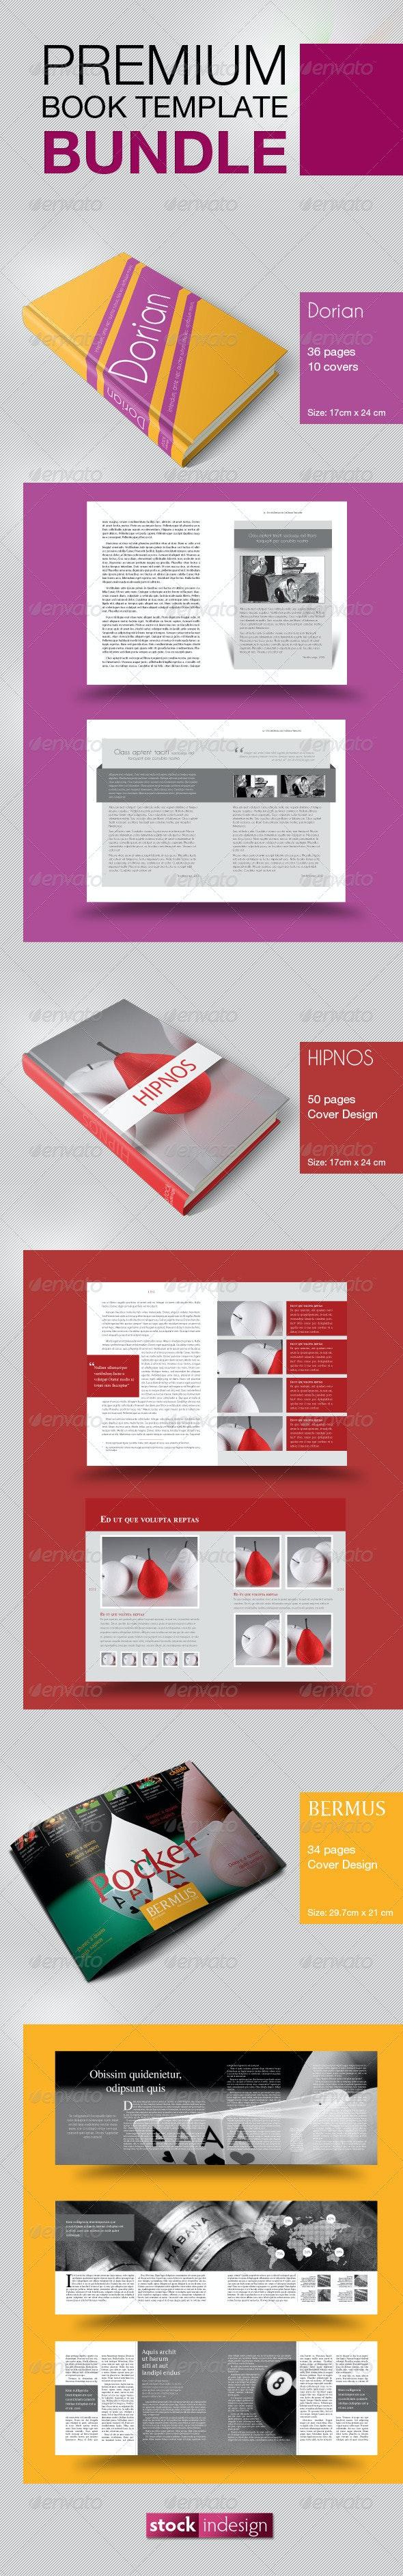 Book Template Bundle - Miscellaneous Print Templates